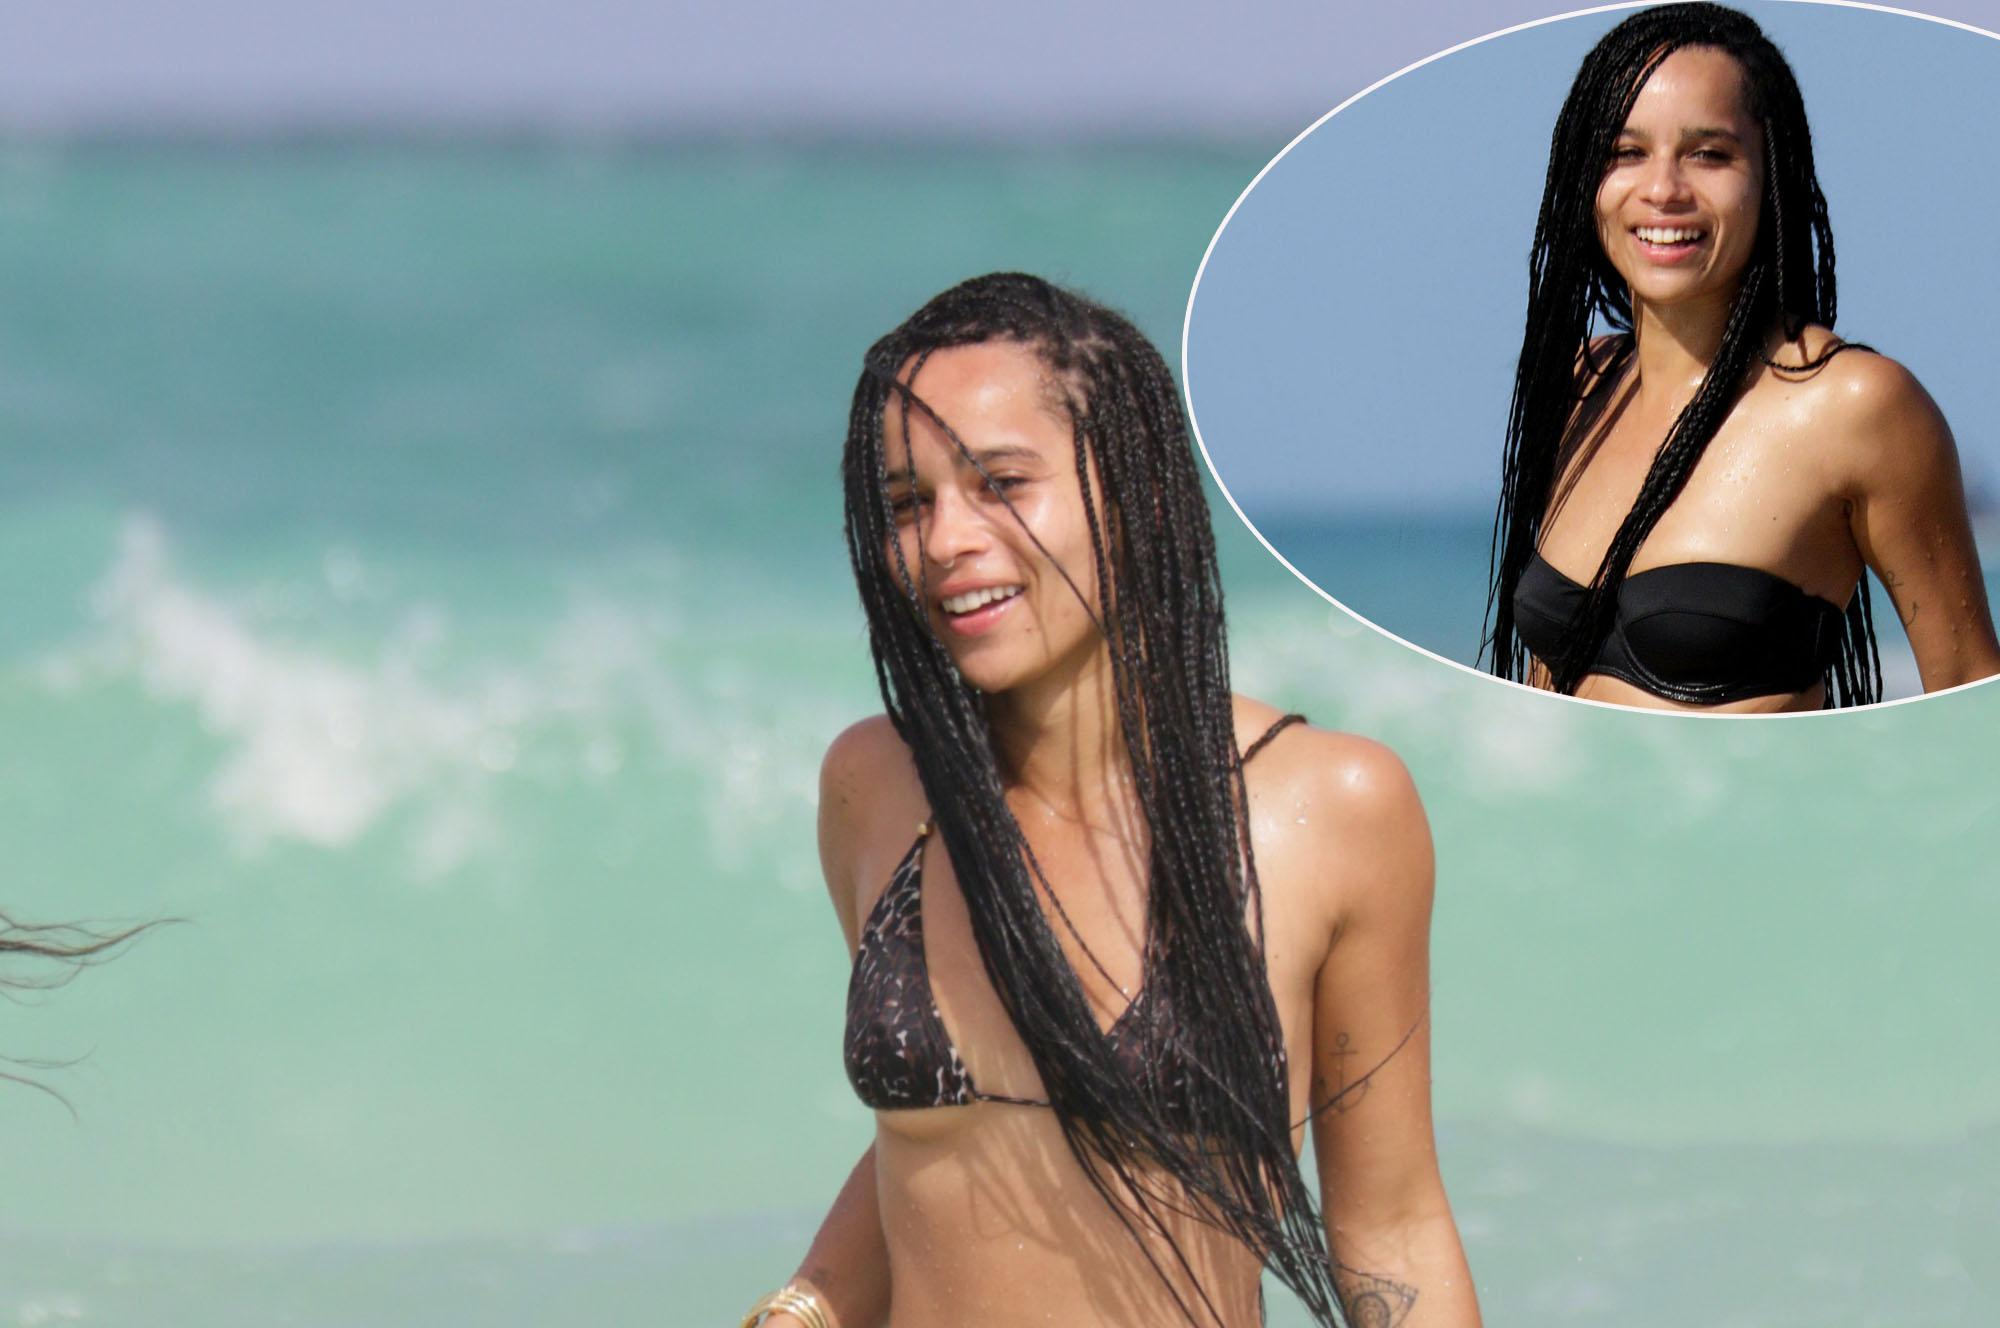 Zoe Kravitz spotted in an animal print bikini at the beach in Miami